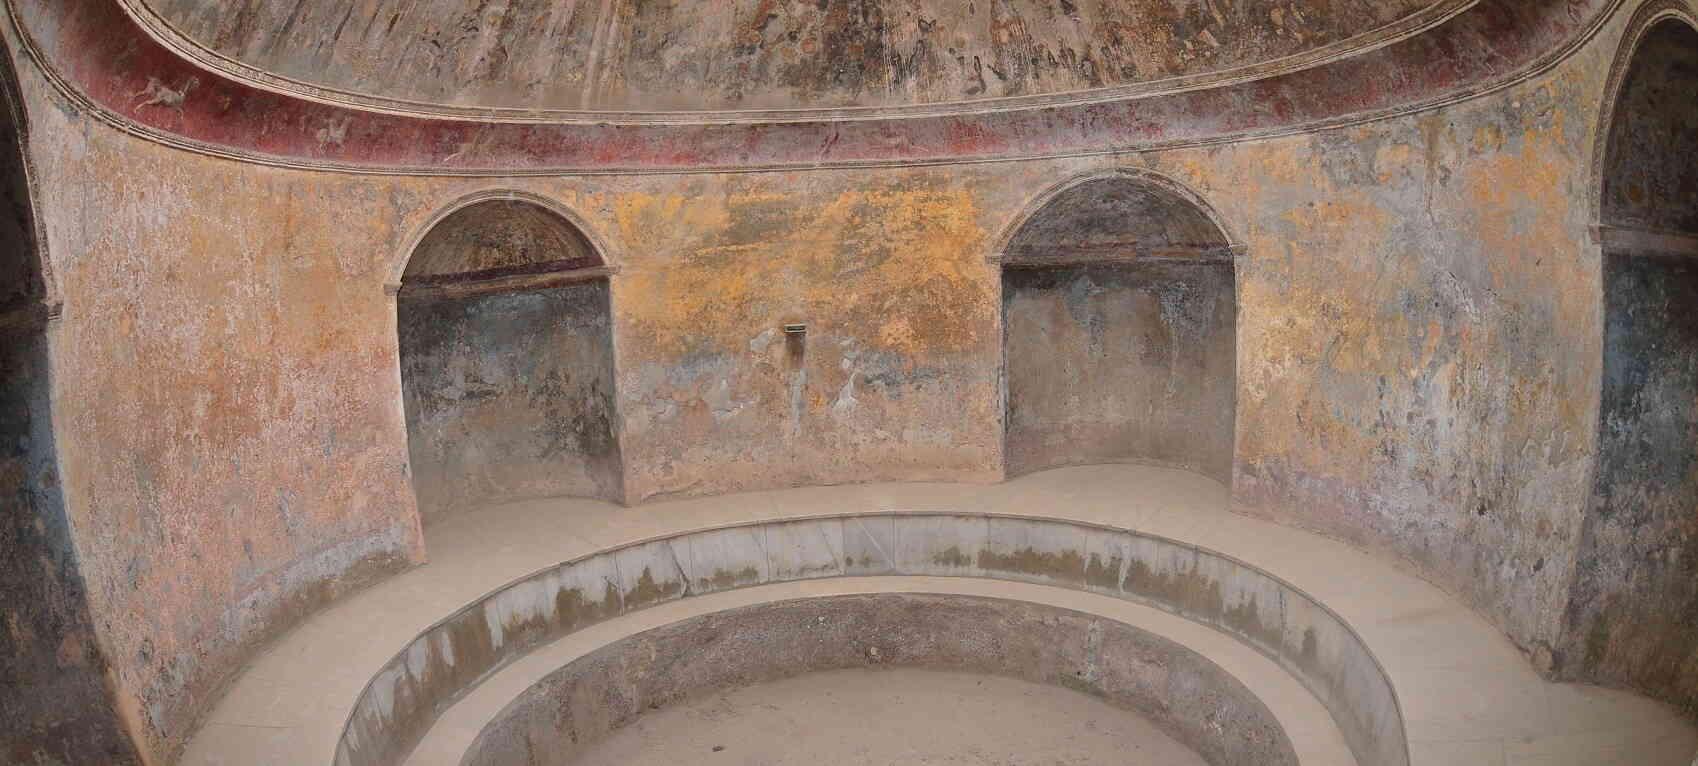 The Bathhouses of Pompeii